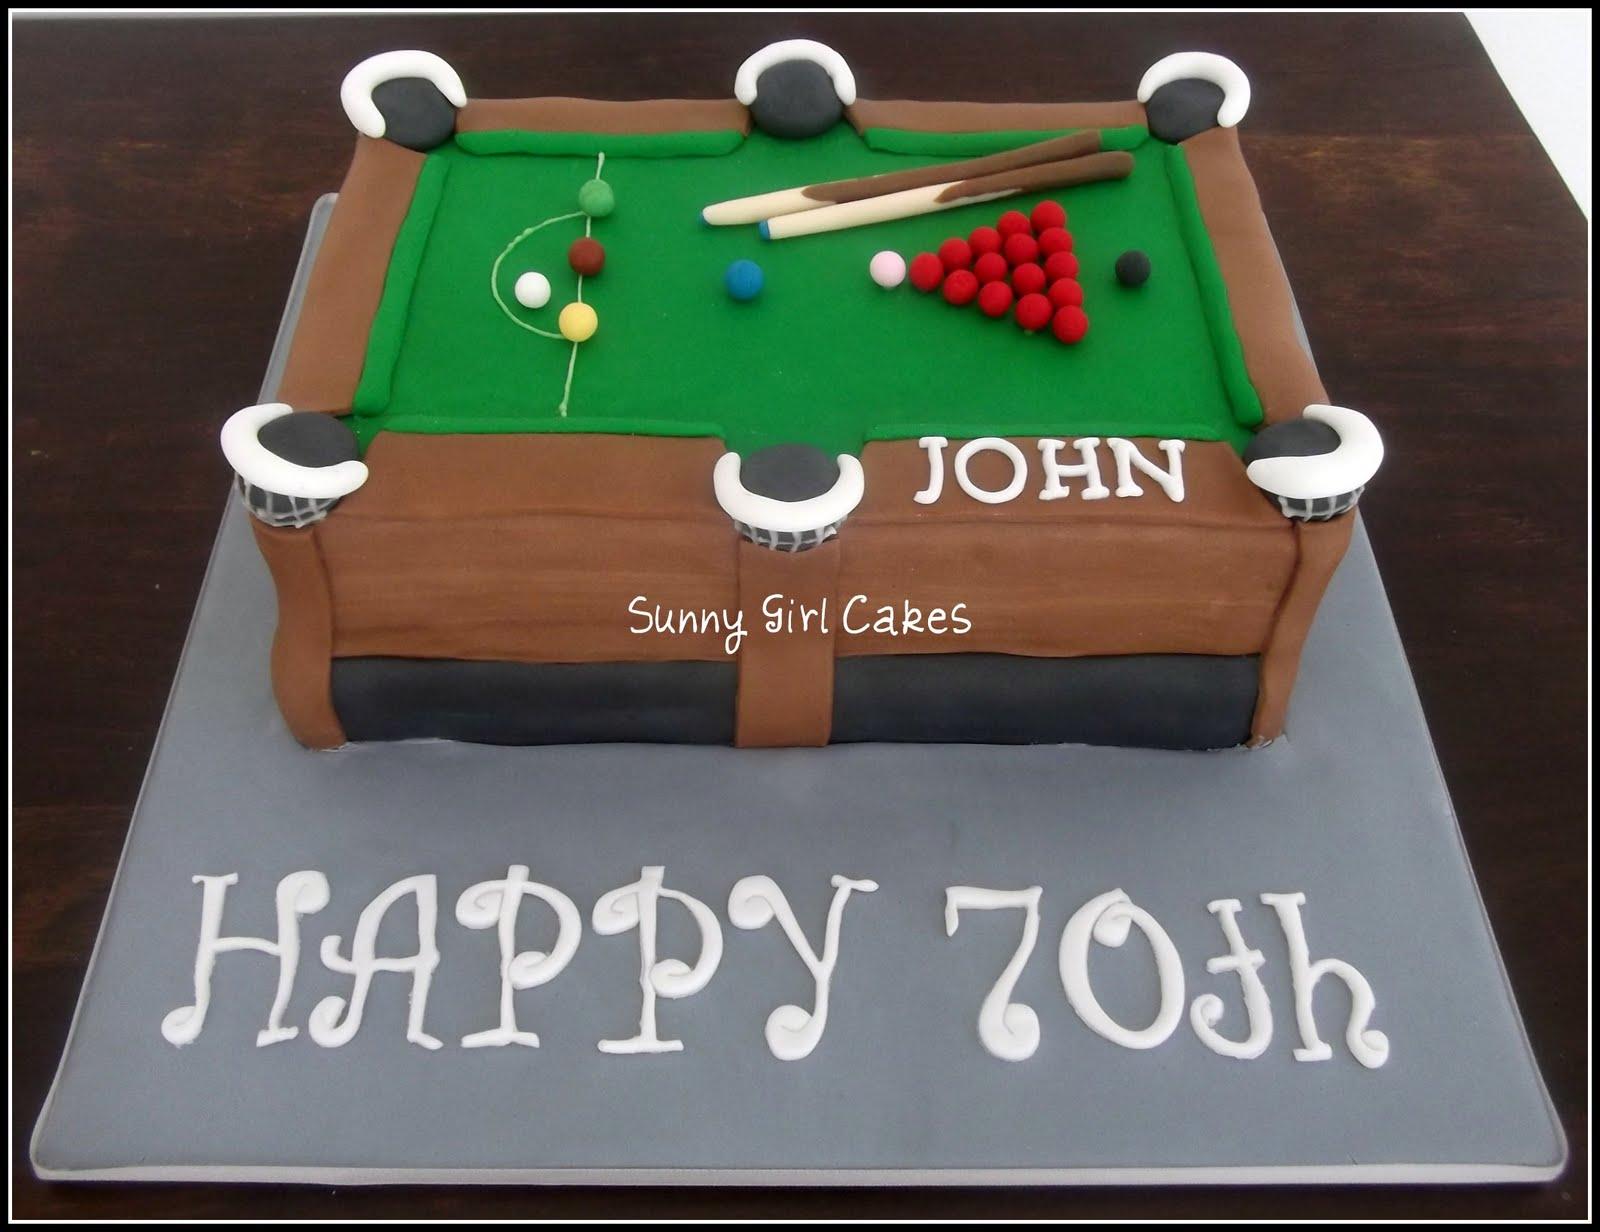 Snooker Cake For Johns 70th Birthday Sunny Girl Cakes